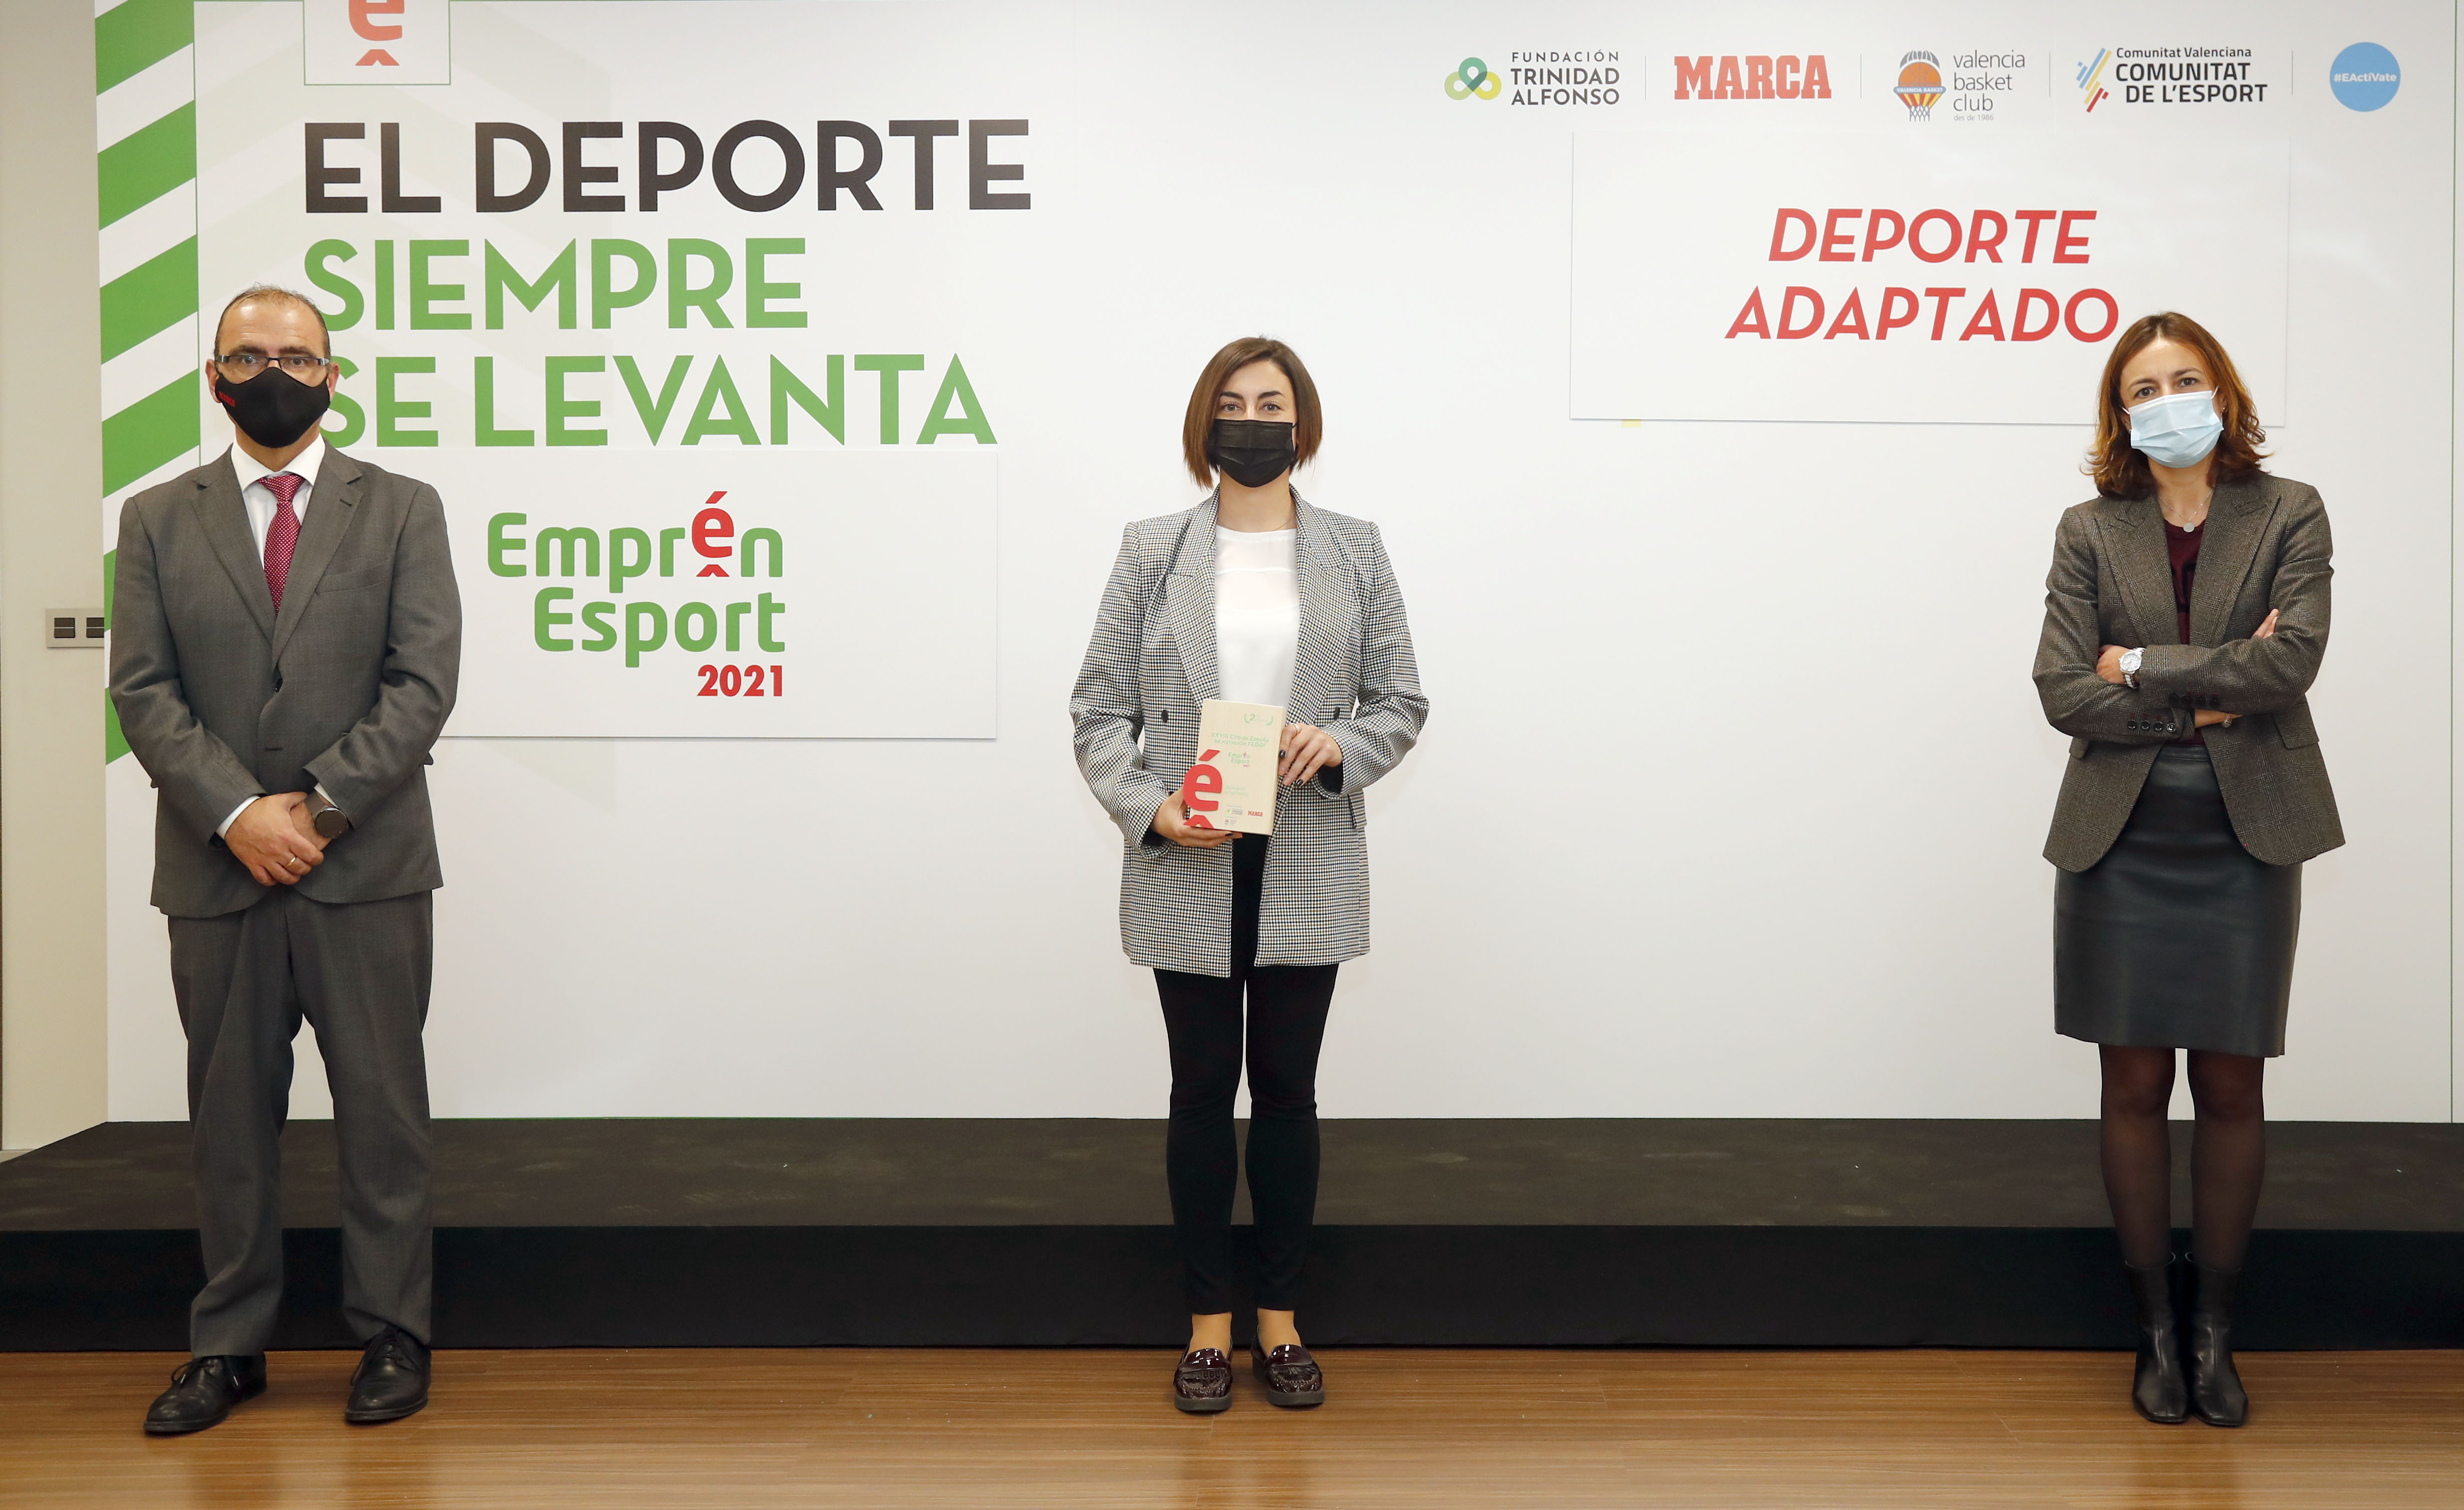 FEDDI EMPREN ESPOR CELIA GARROTE